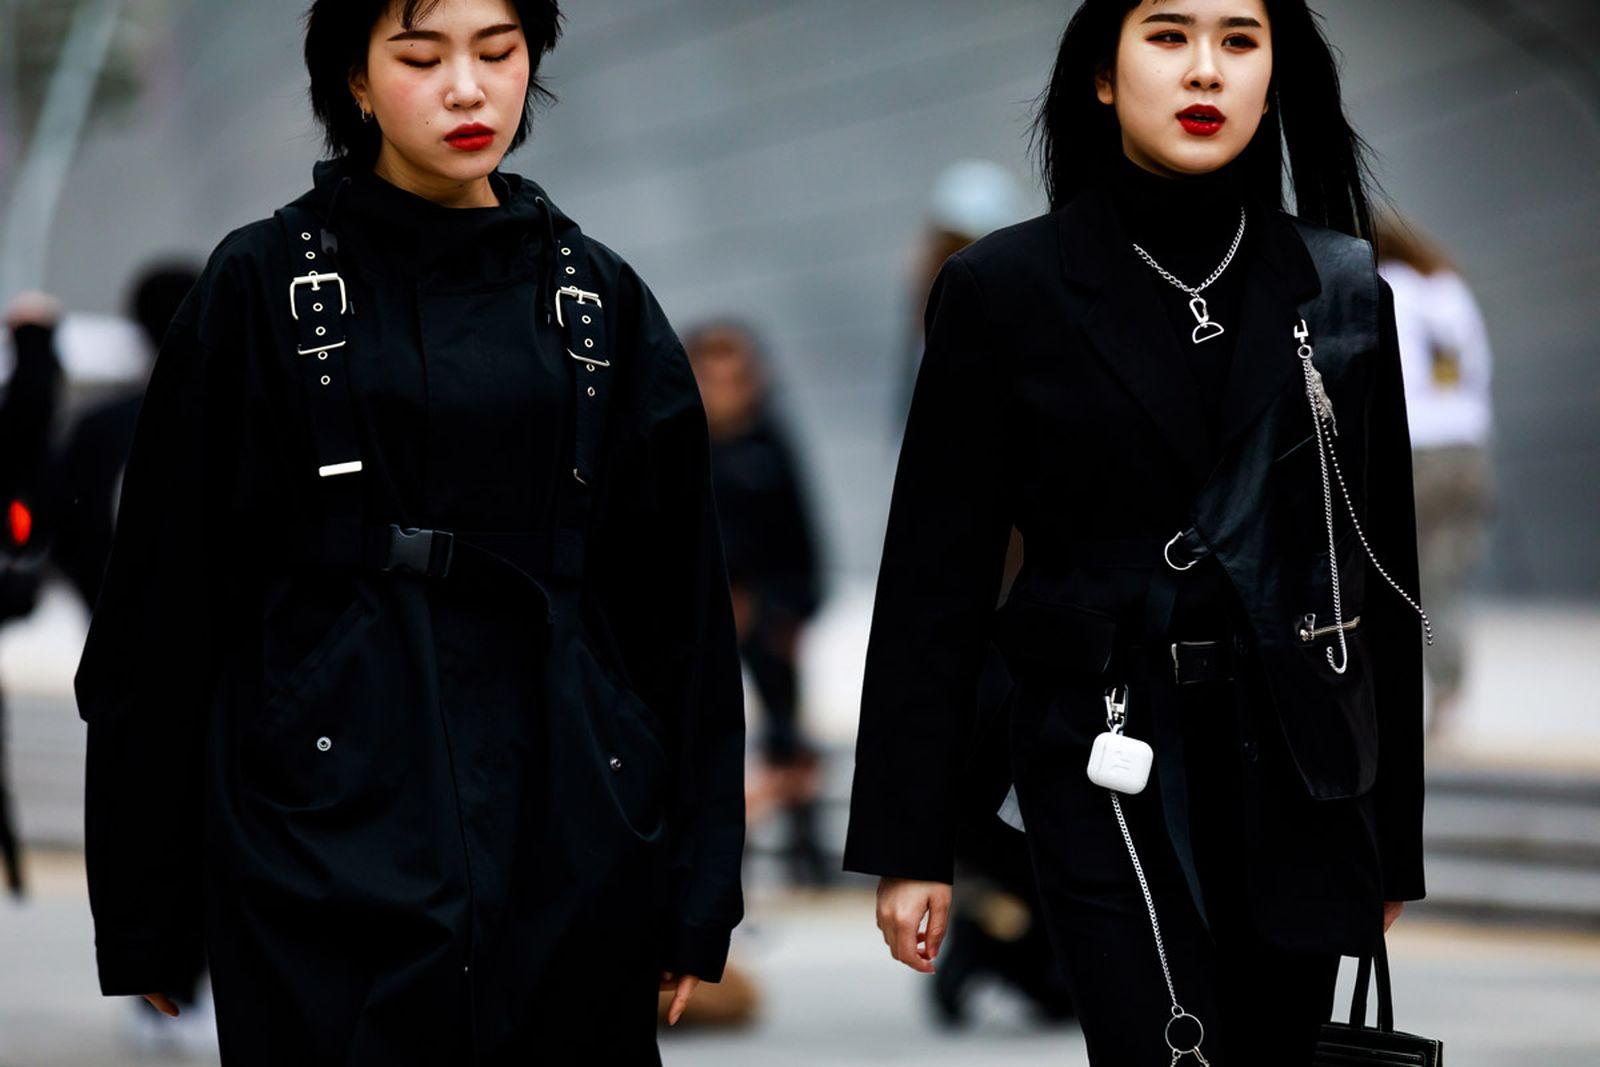 19Seoul street style march paul jeong seoul fashion week